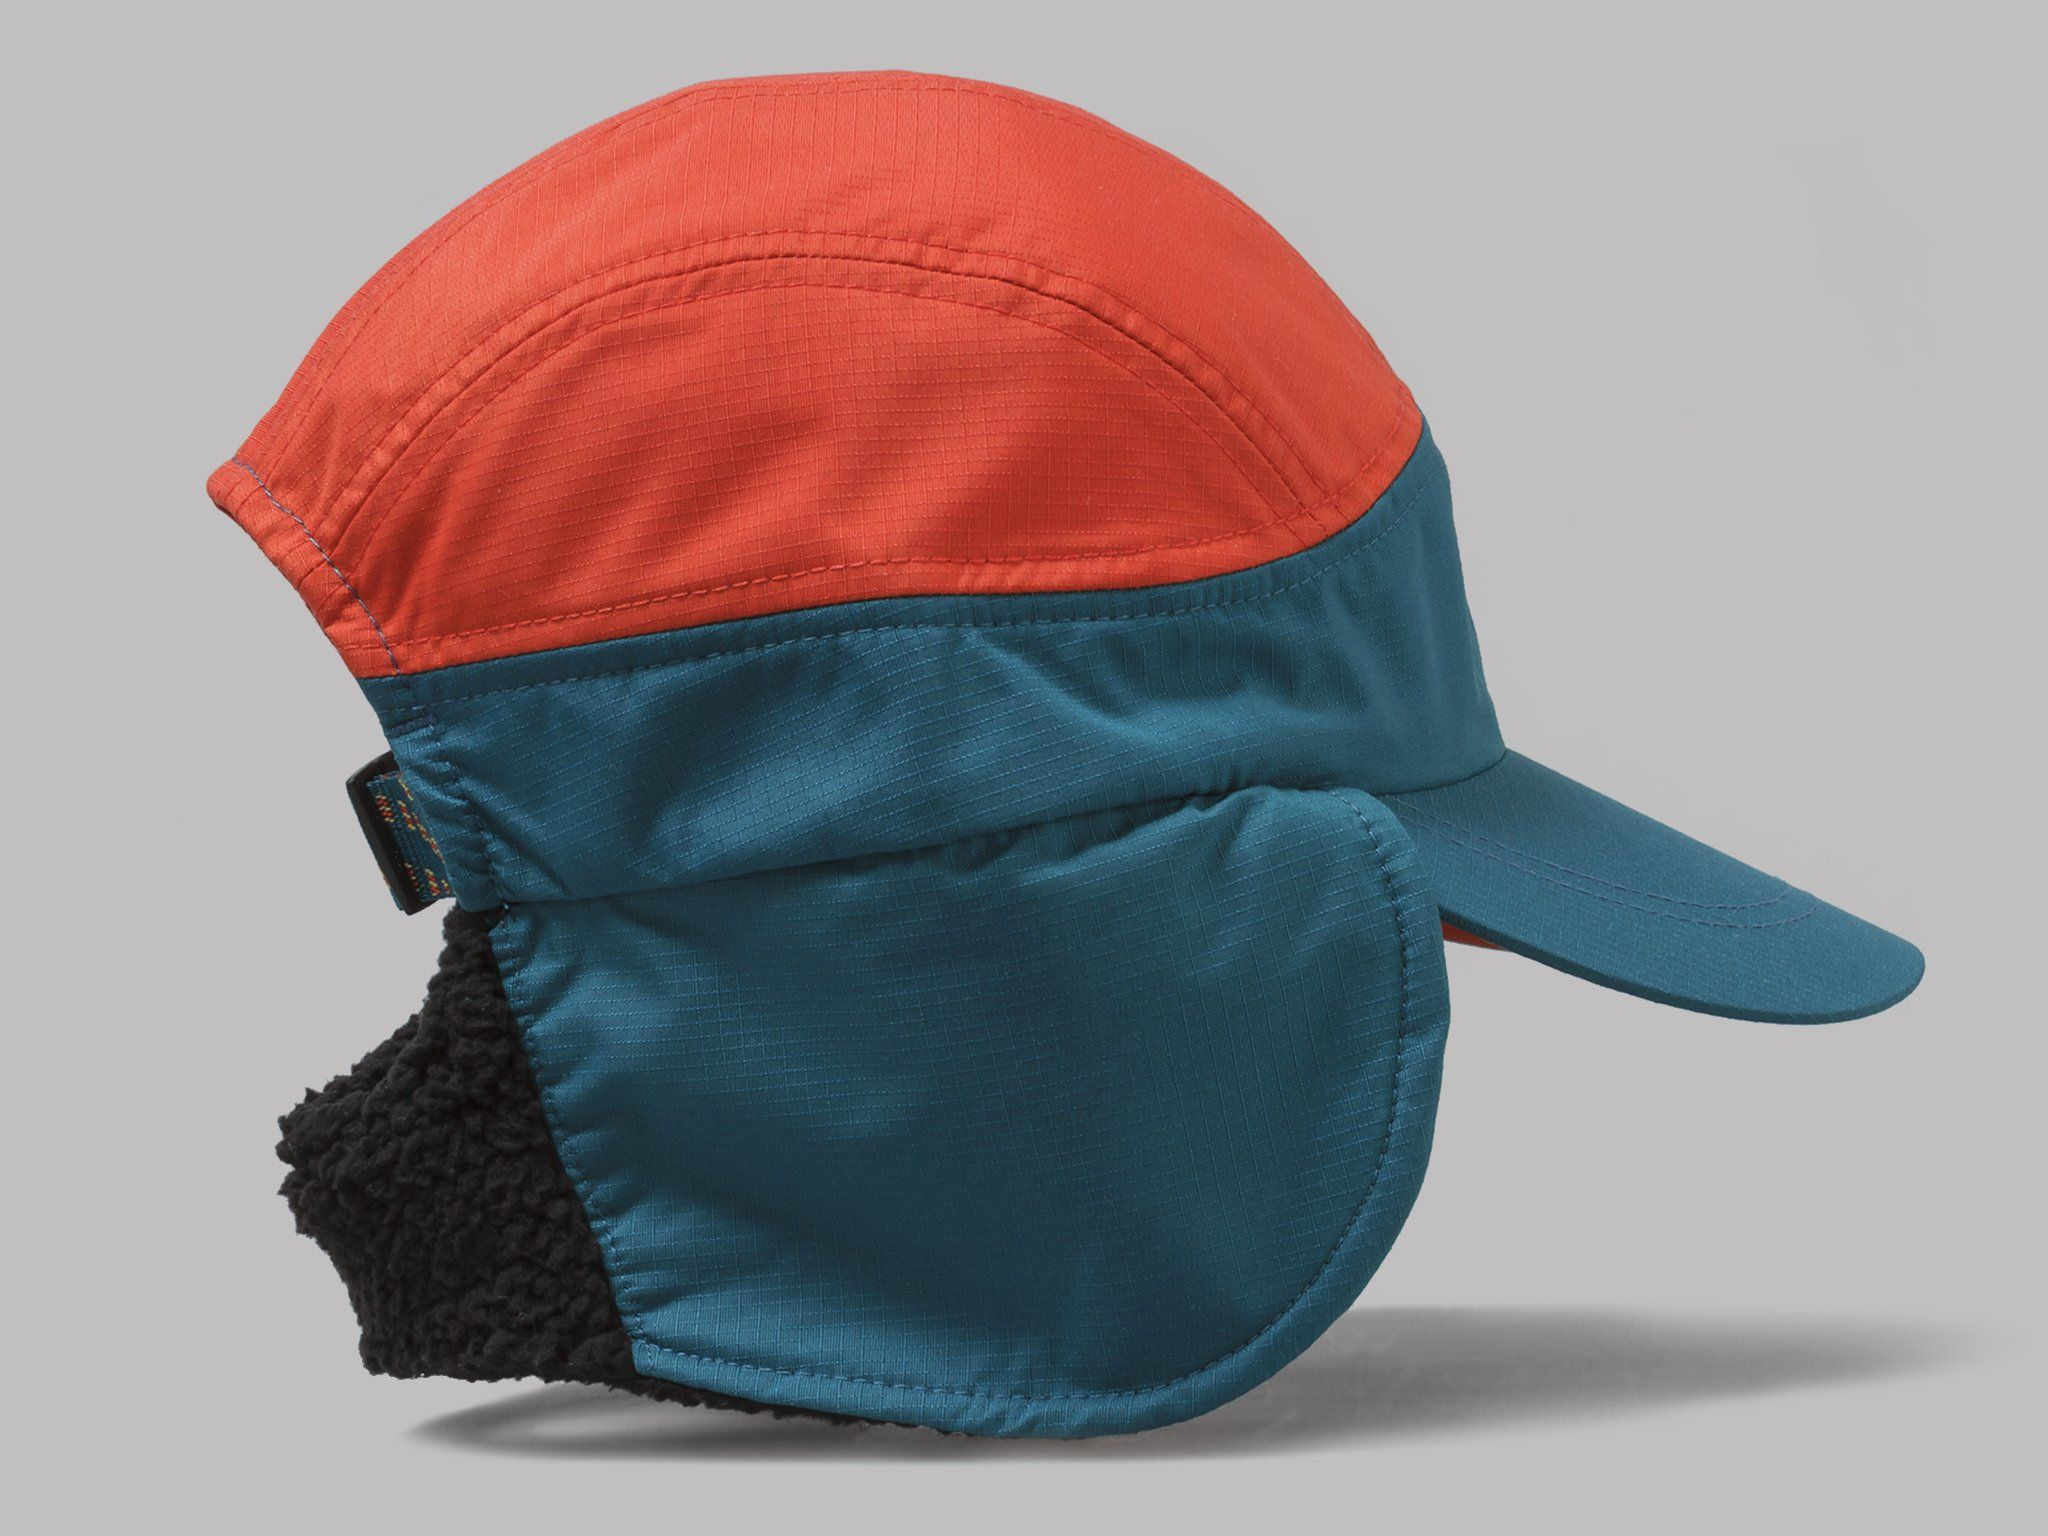 2676d8b22e3 Nike ACG Sherpa Tailwind Cap (Geode Teal   Habanero Red   Enero red Geode  Teal